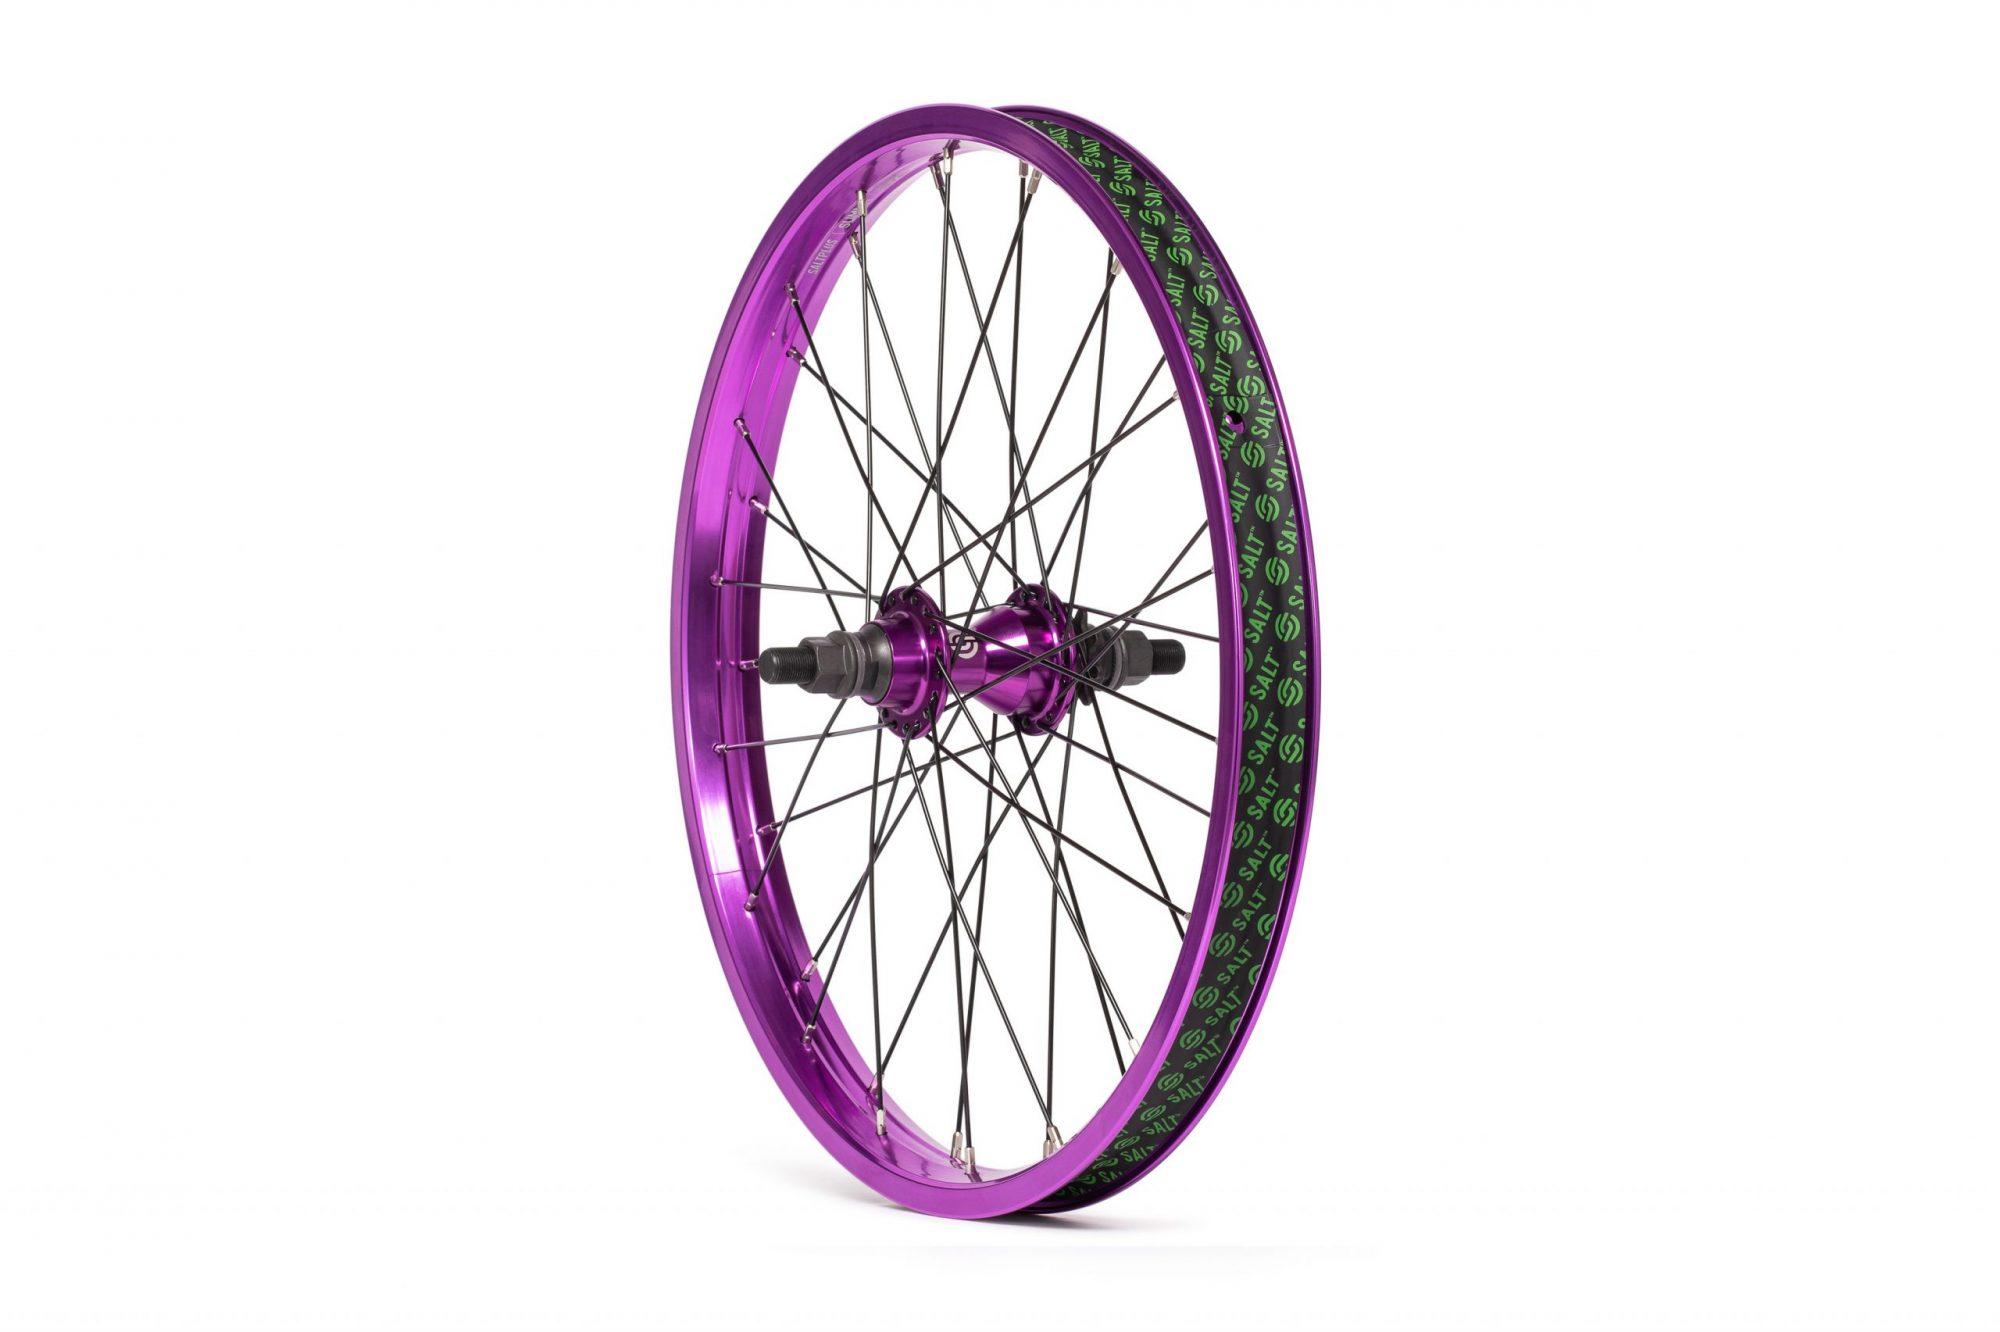 Salt_Everest_CS_rear_wheel_purple-02